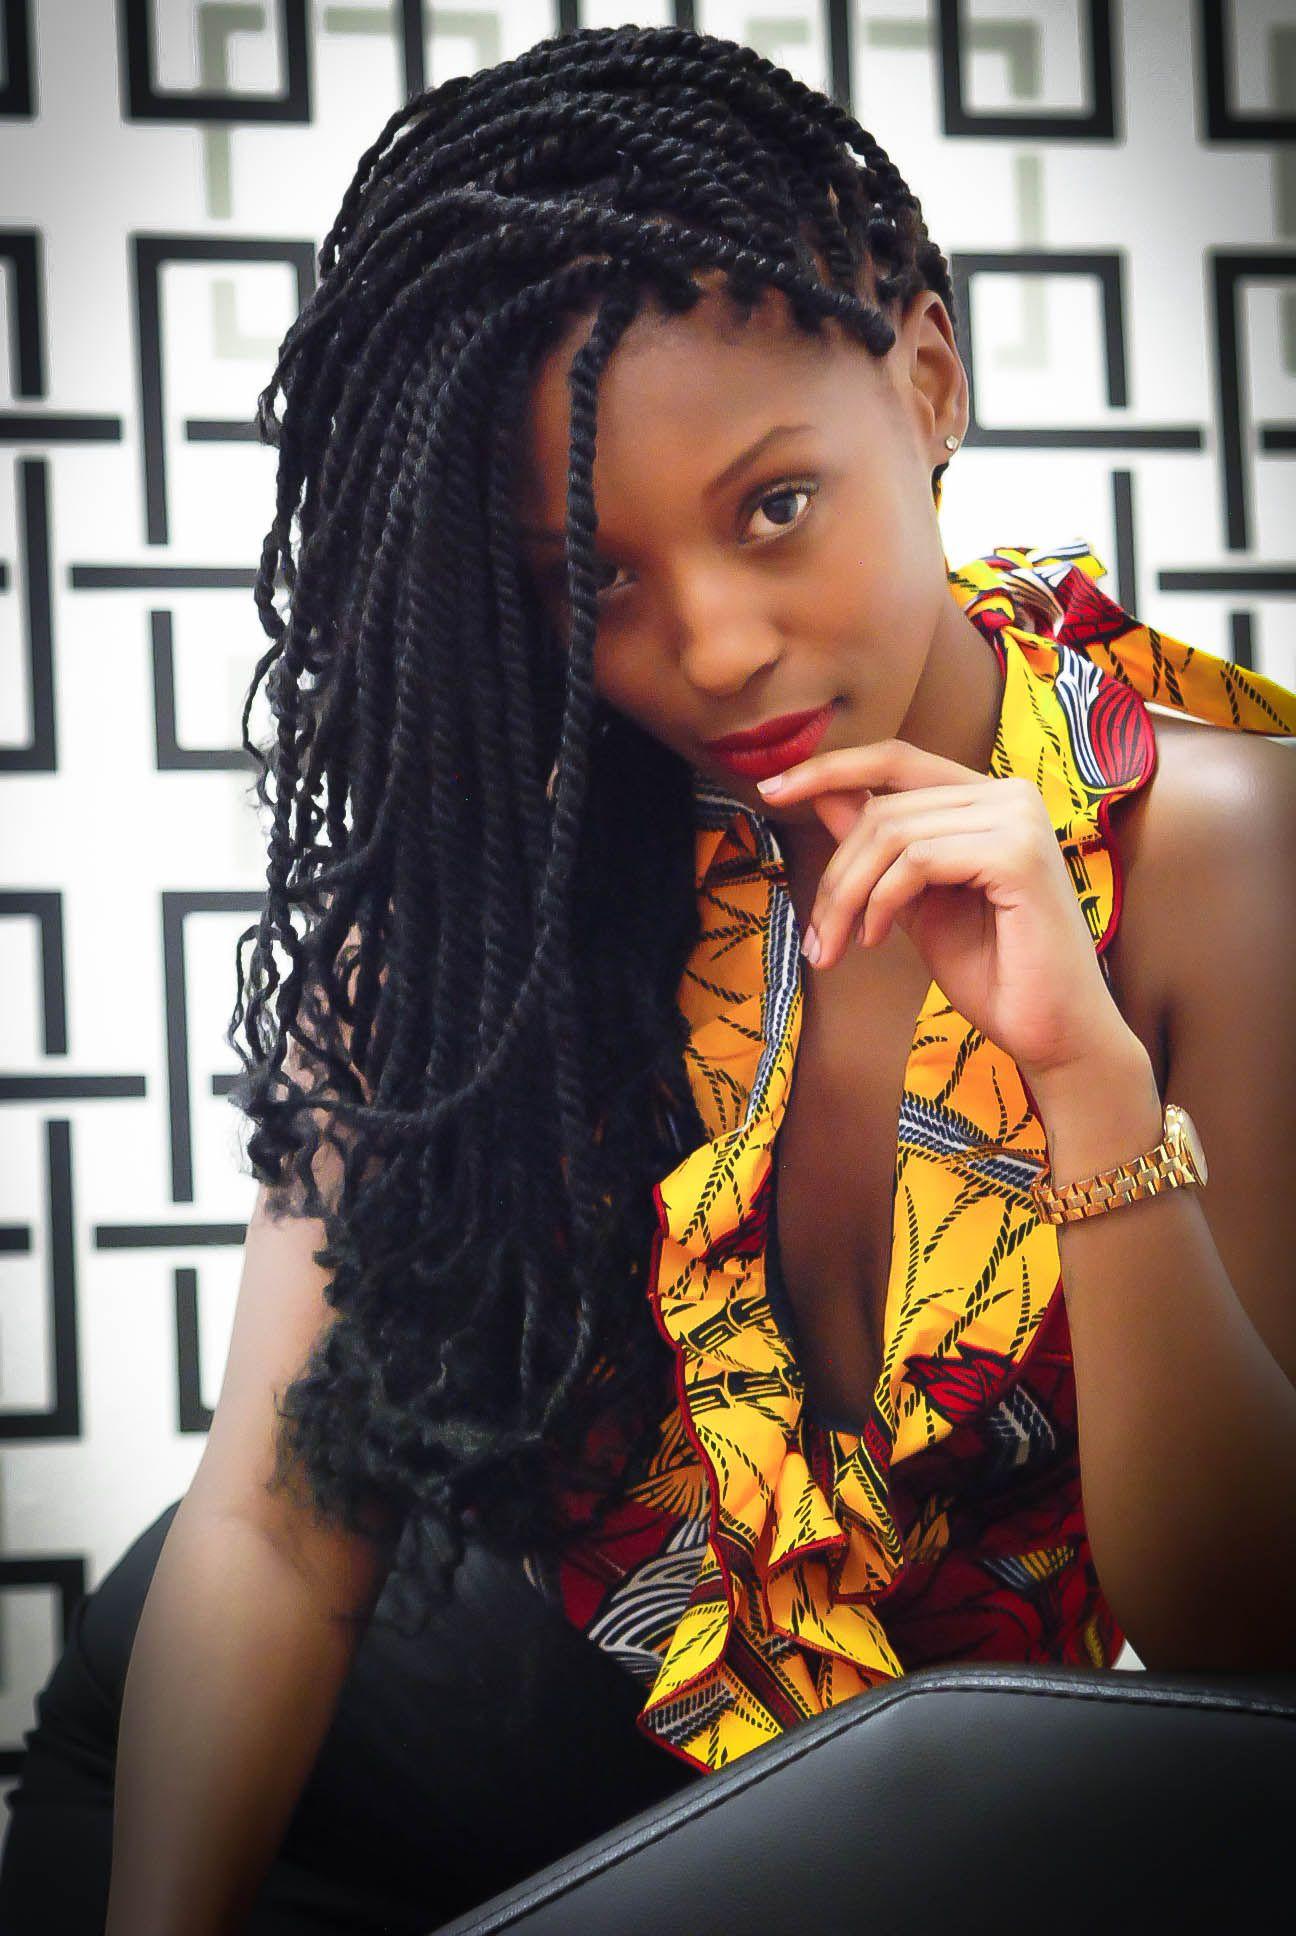 marley twist 6 - senegalese twists charlotte nc | unisex beauty